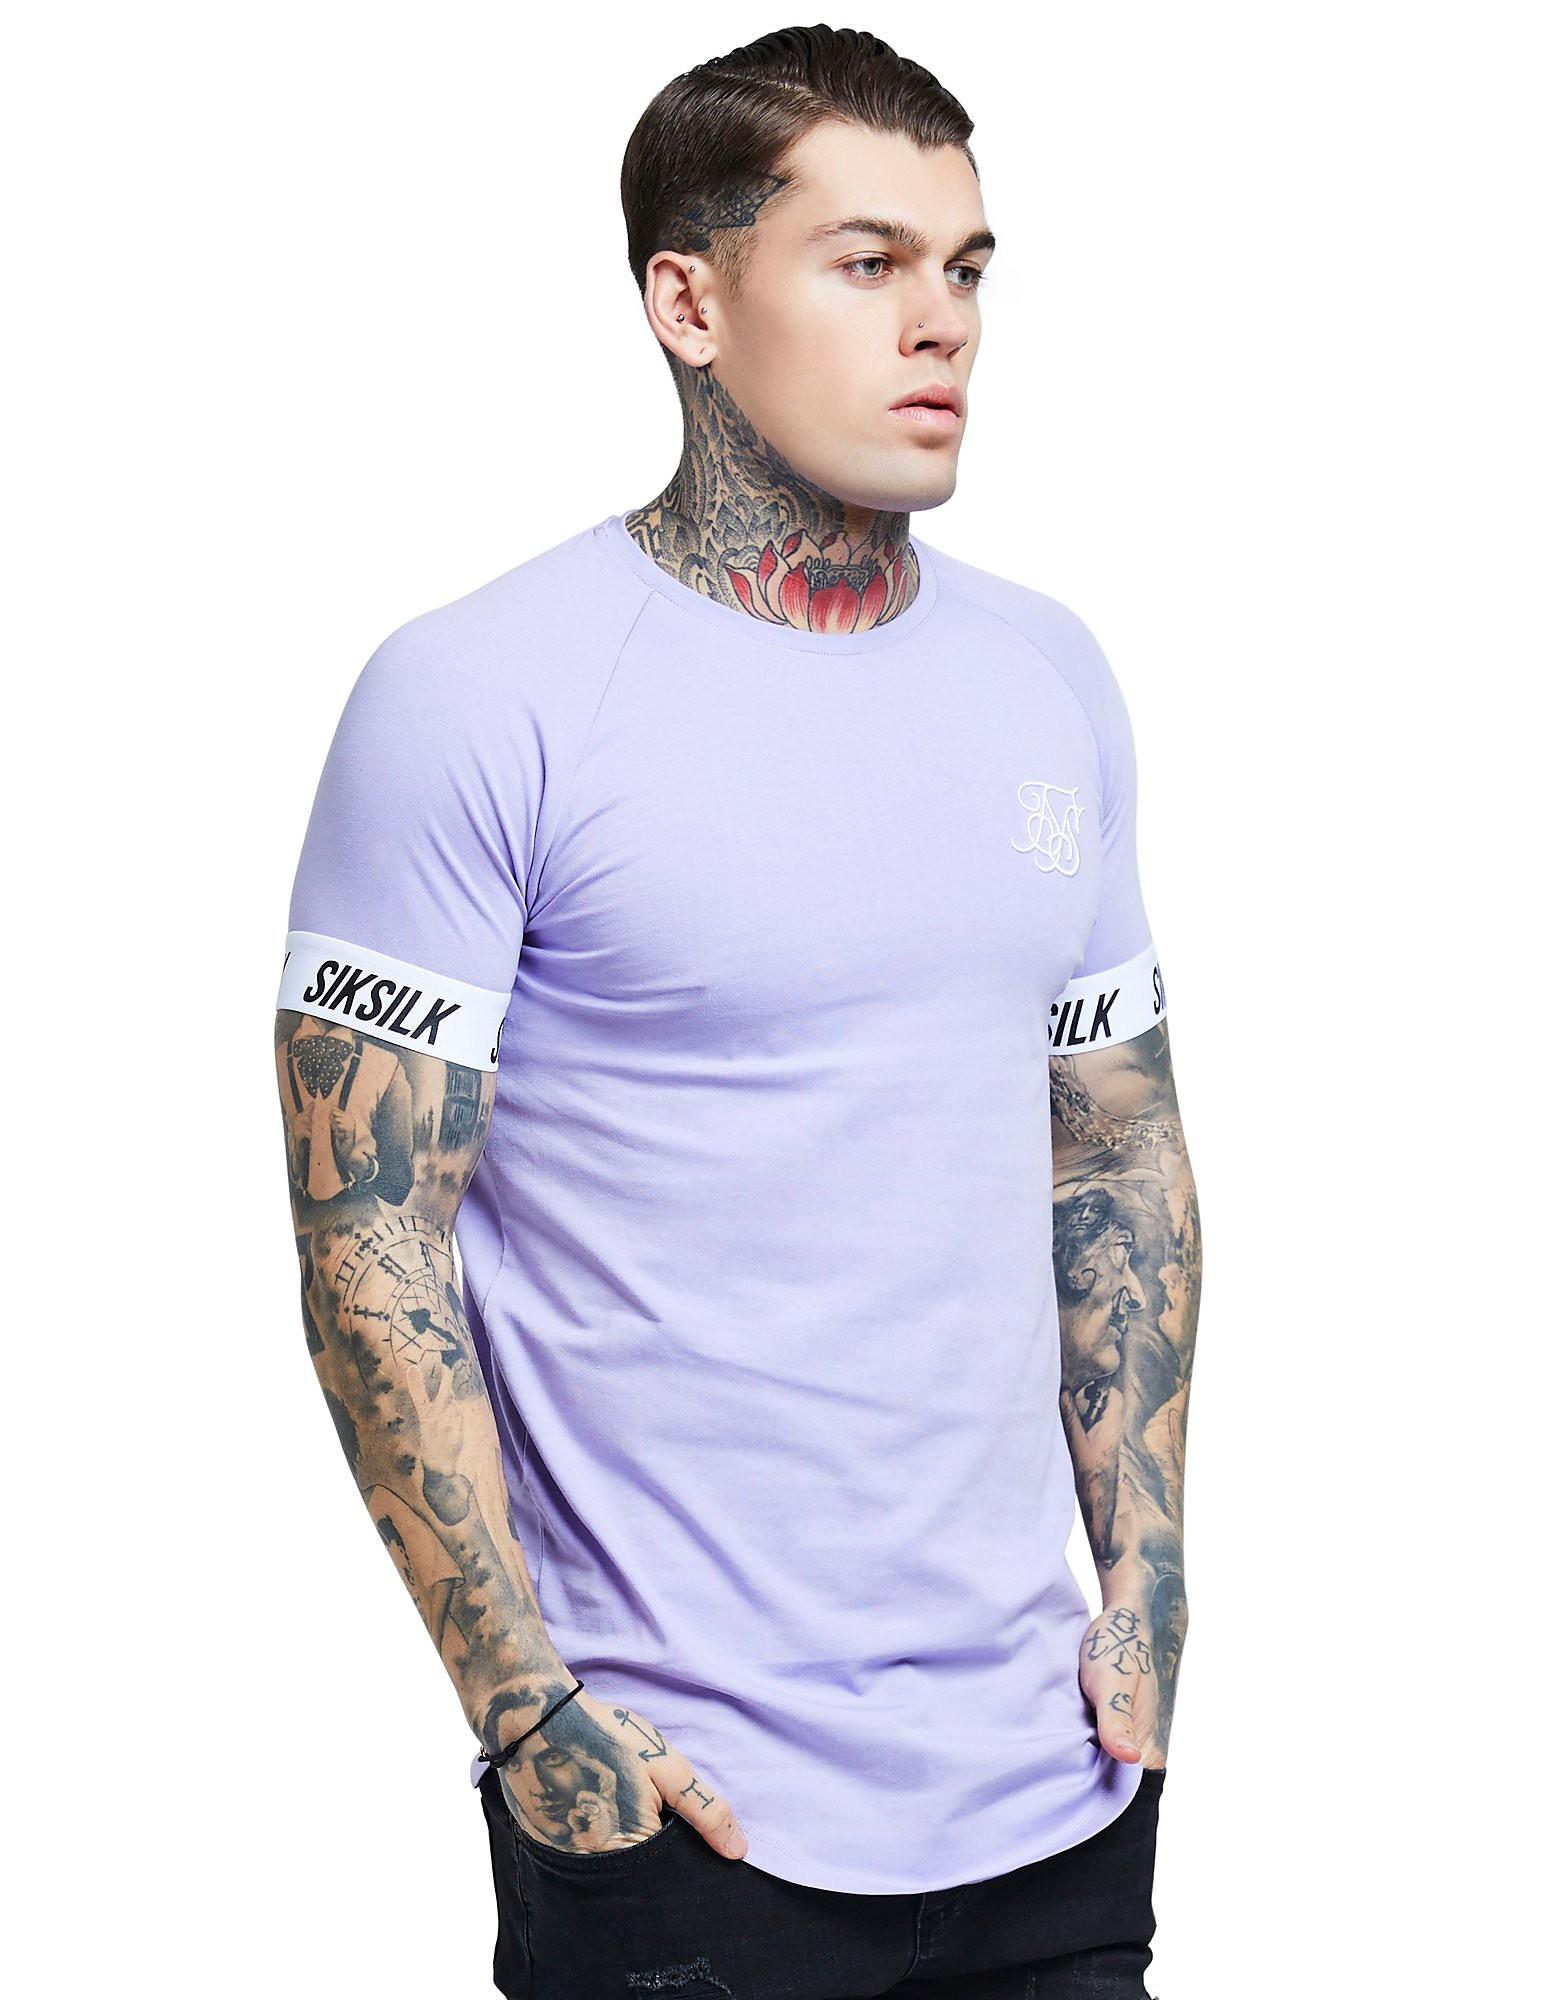 SikSilk Taped Sleeve T-Shirt